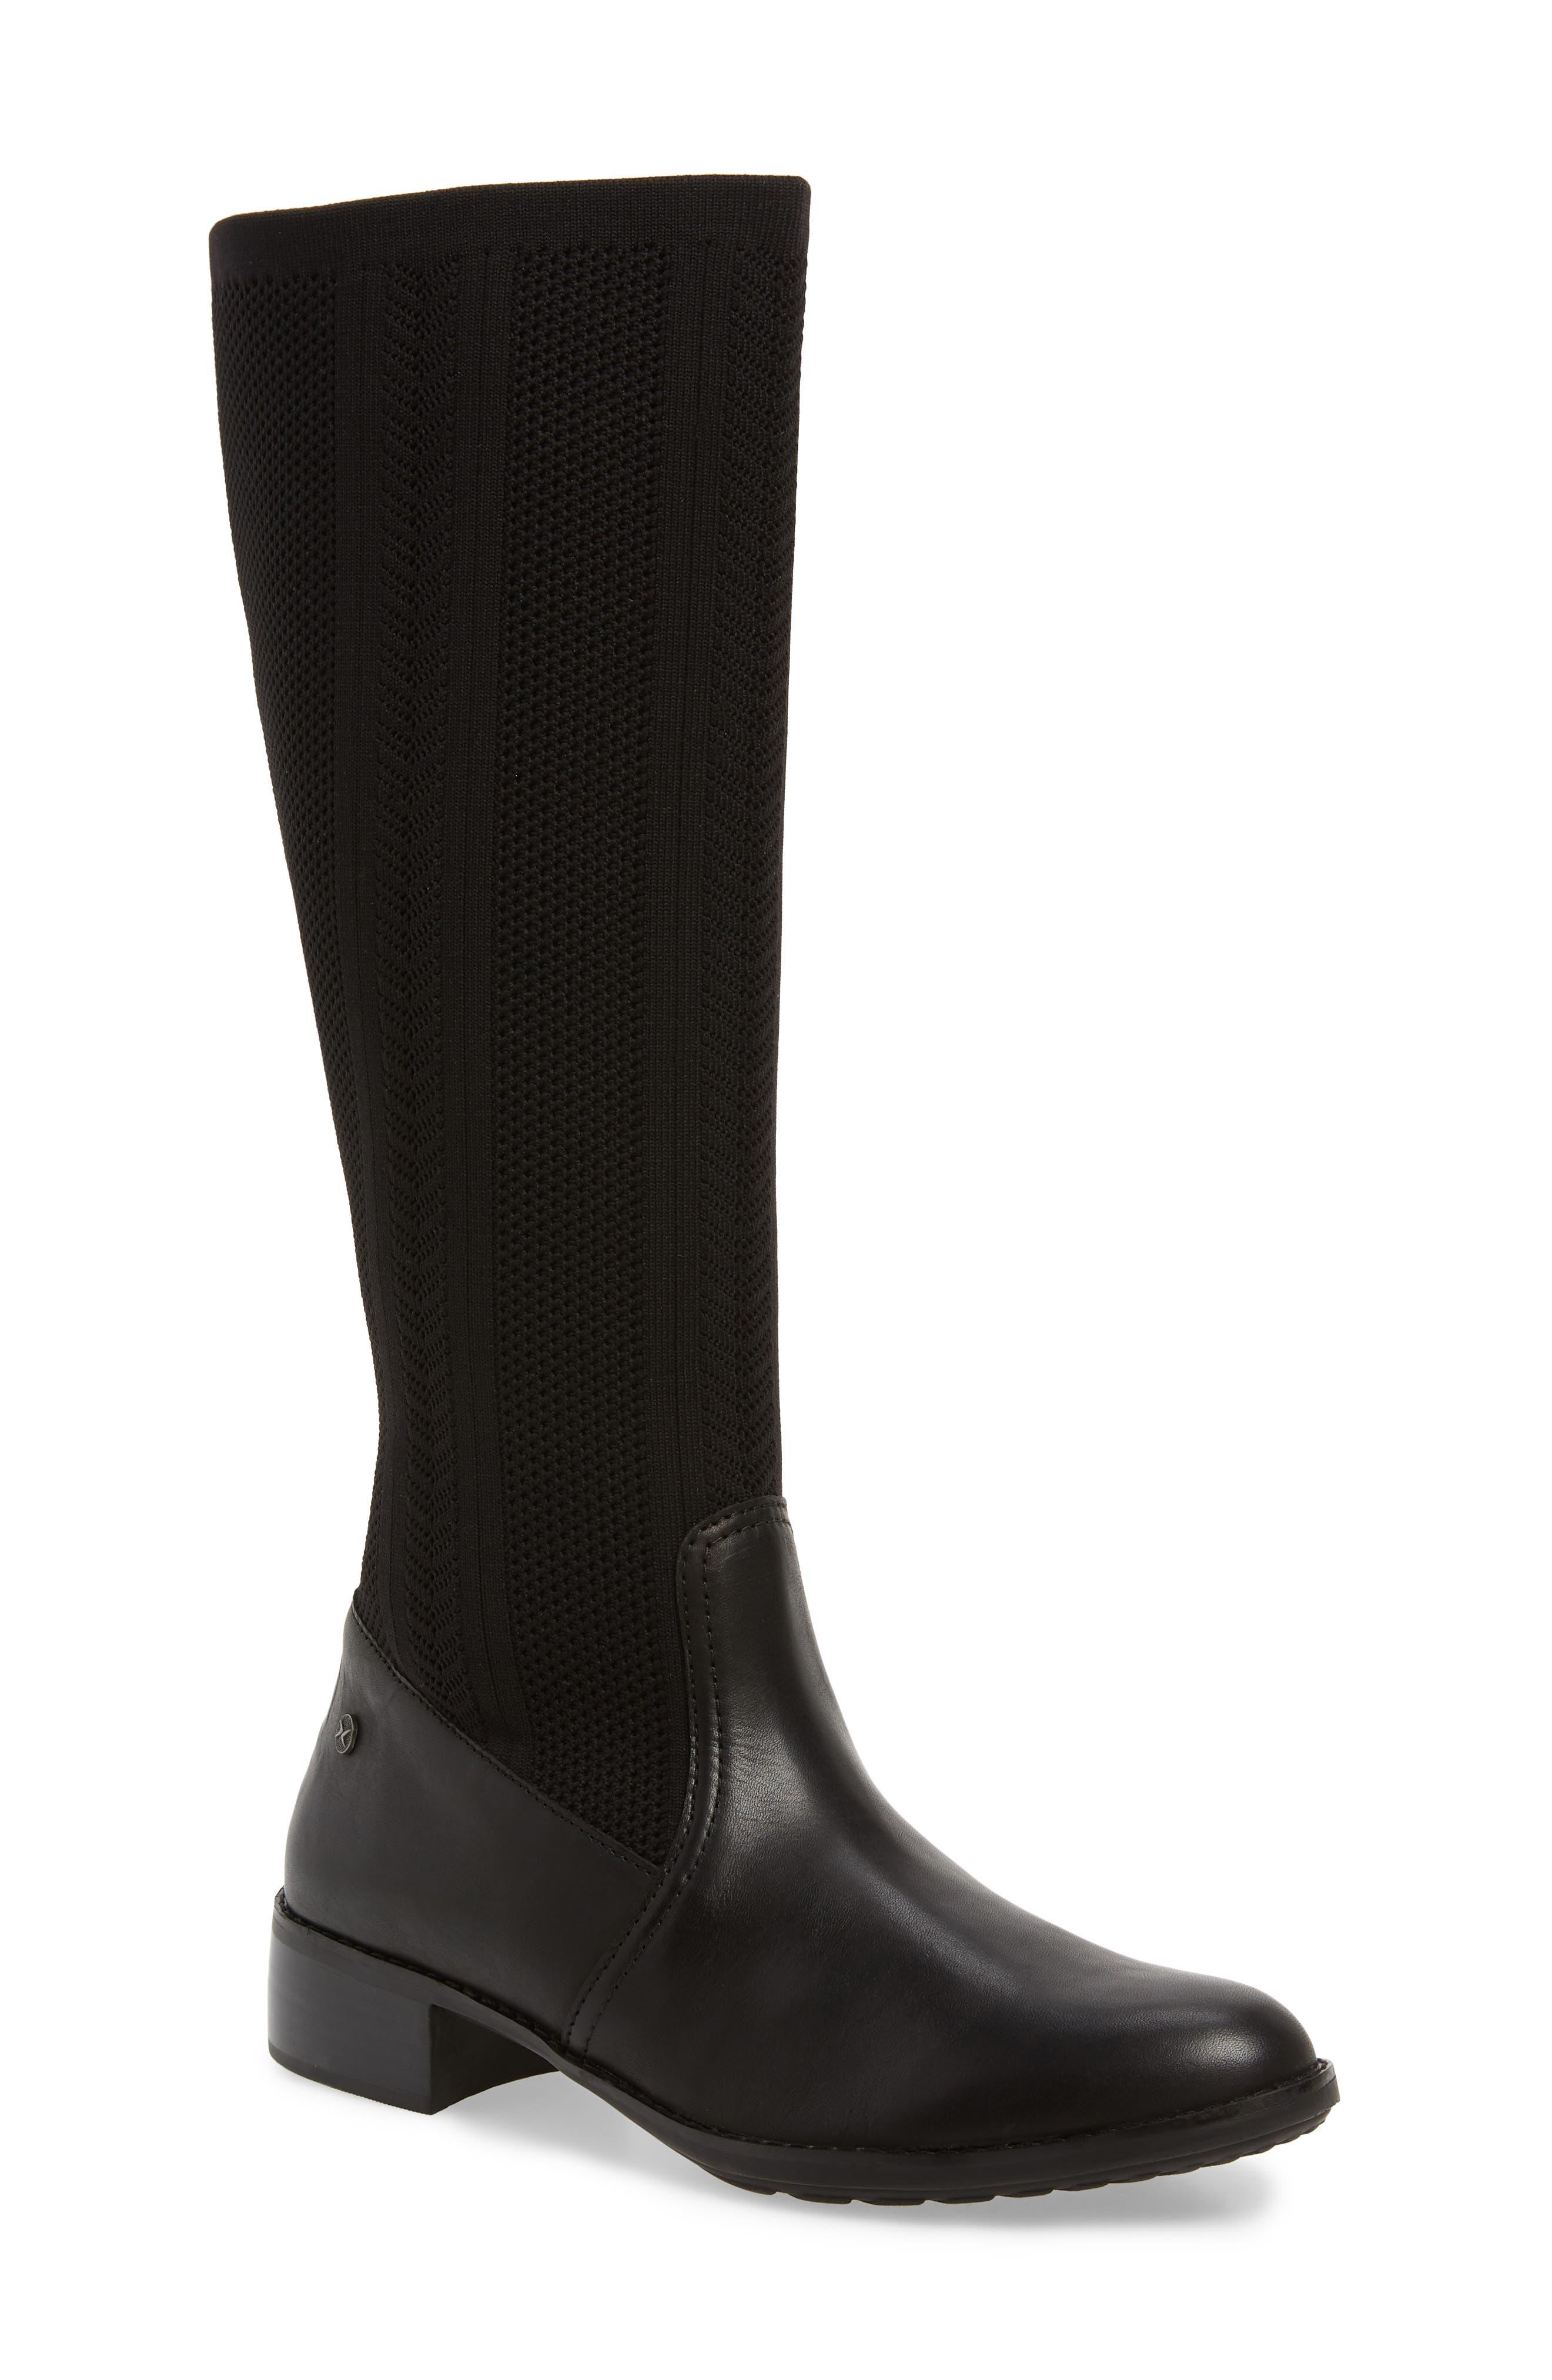 Aetrex Belle Sock Knit Shaft Boot, Black